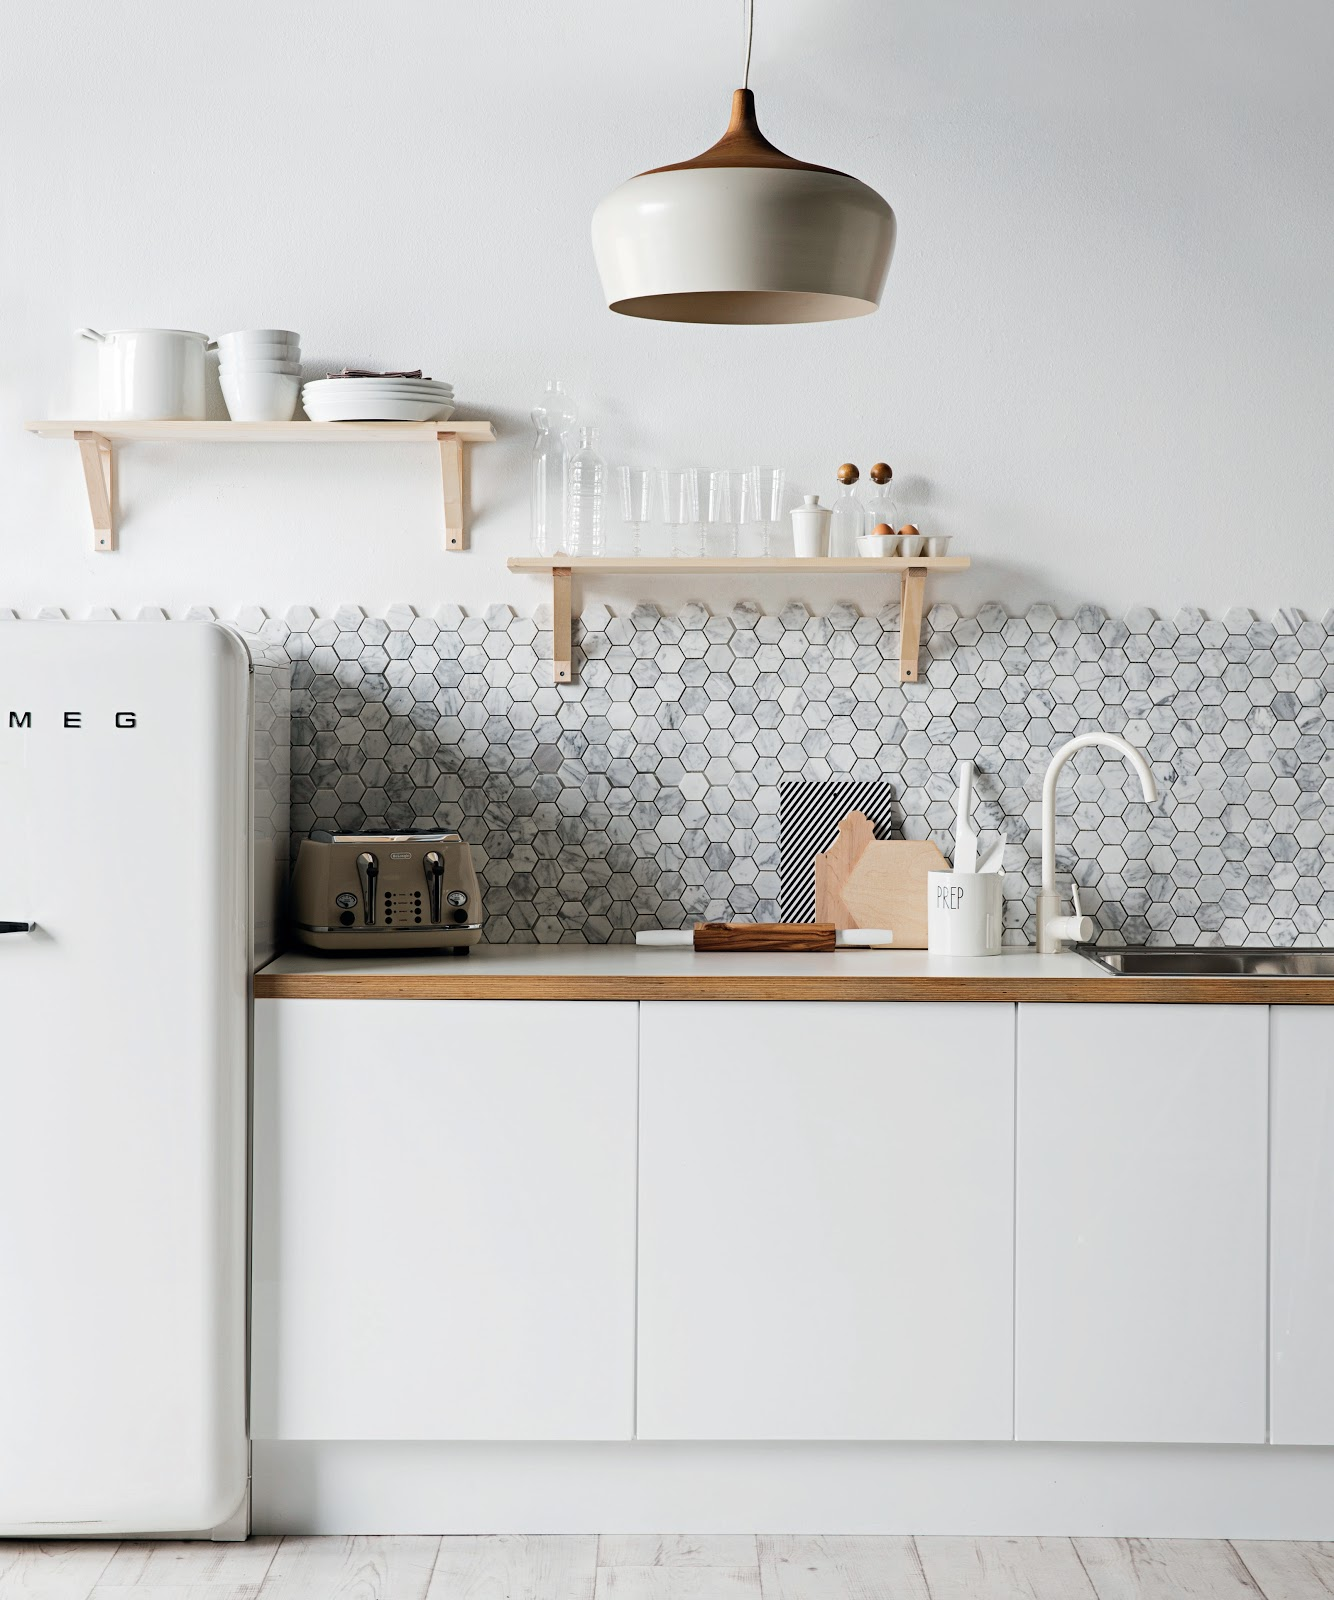 cozinha pastilha revestimento hexagonal cinza